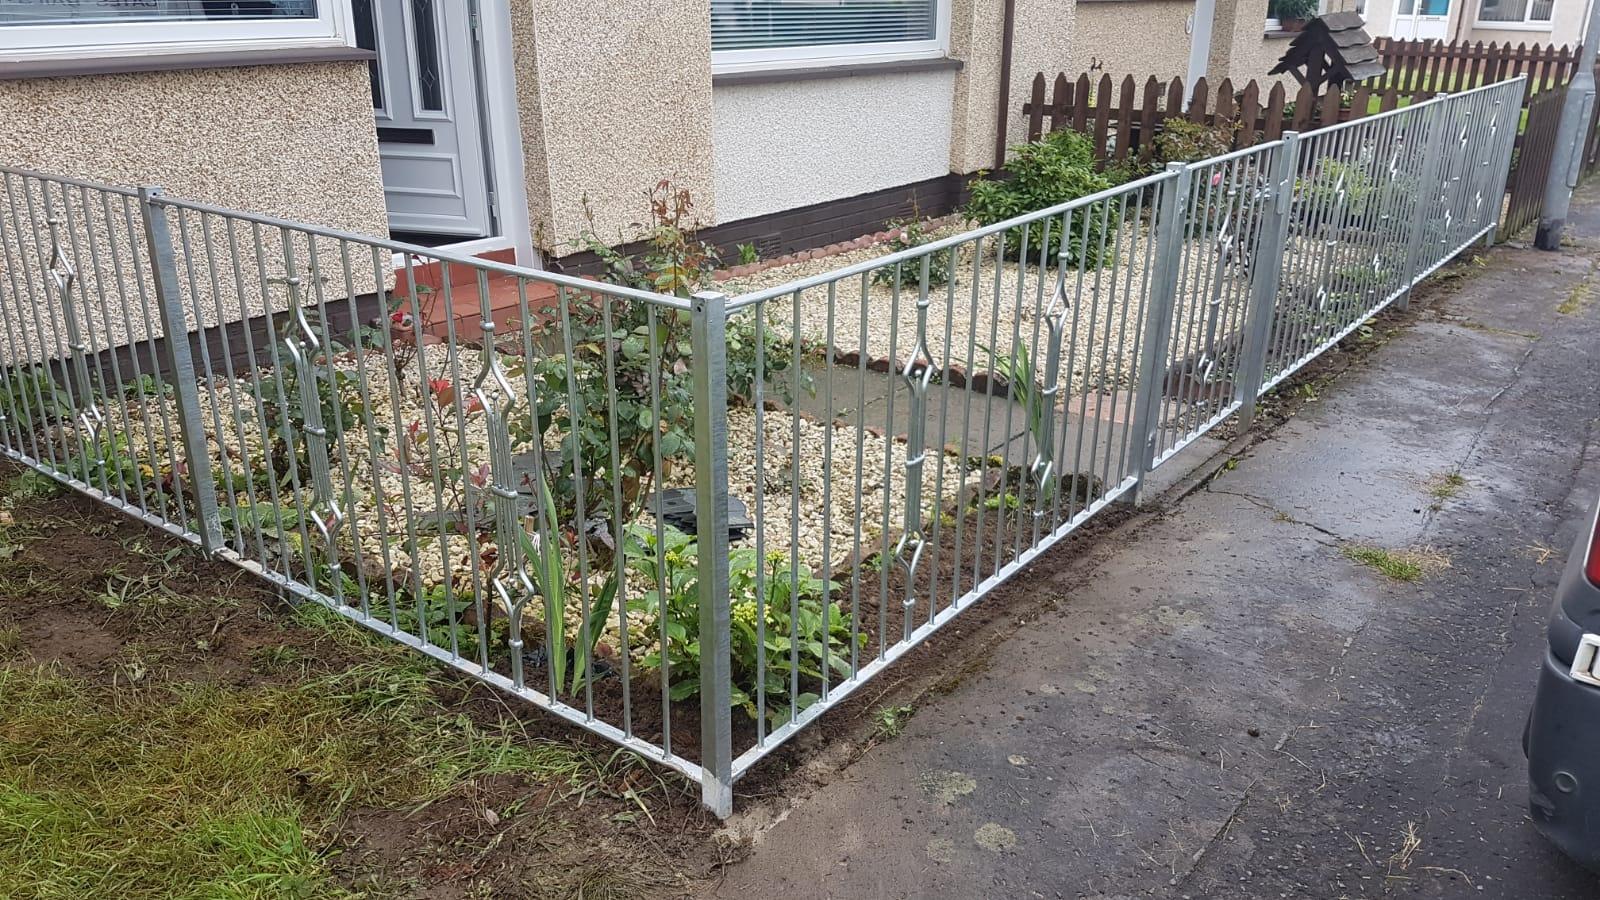 galvanized metal fencing by Dain Art Iron, Ayrshire Scotland.